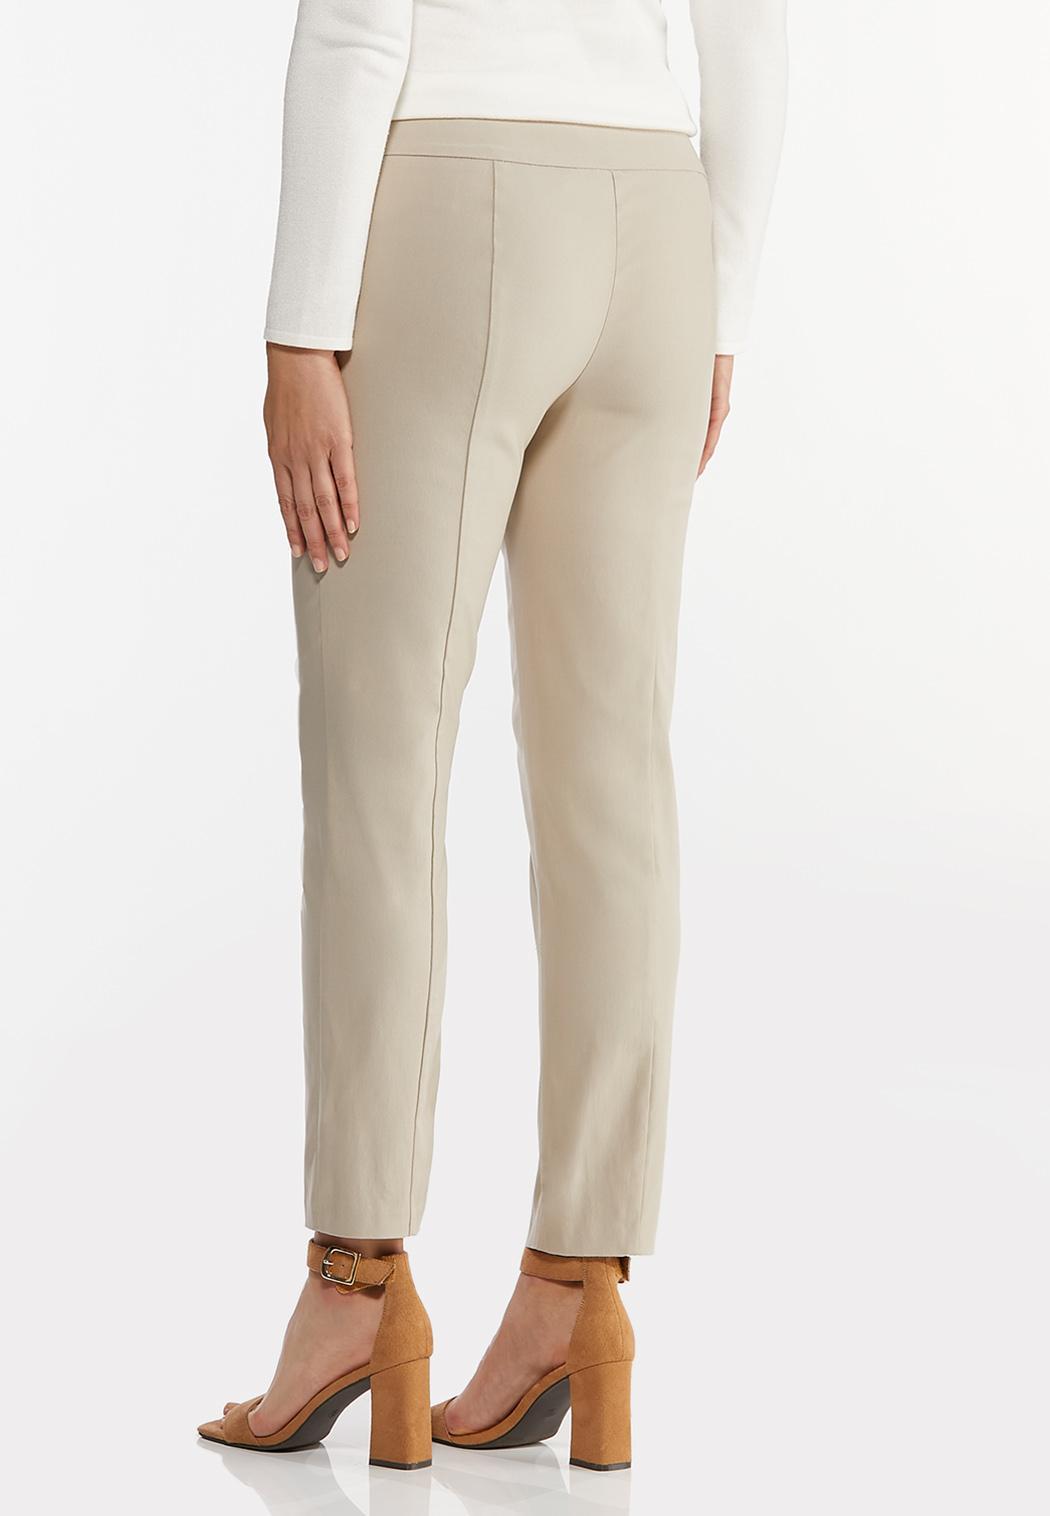 Petite Solid Bengaline Pants (Item #44471770)